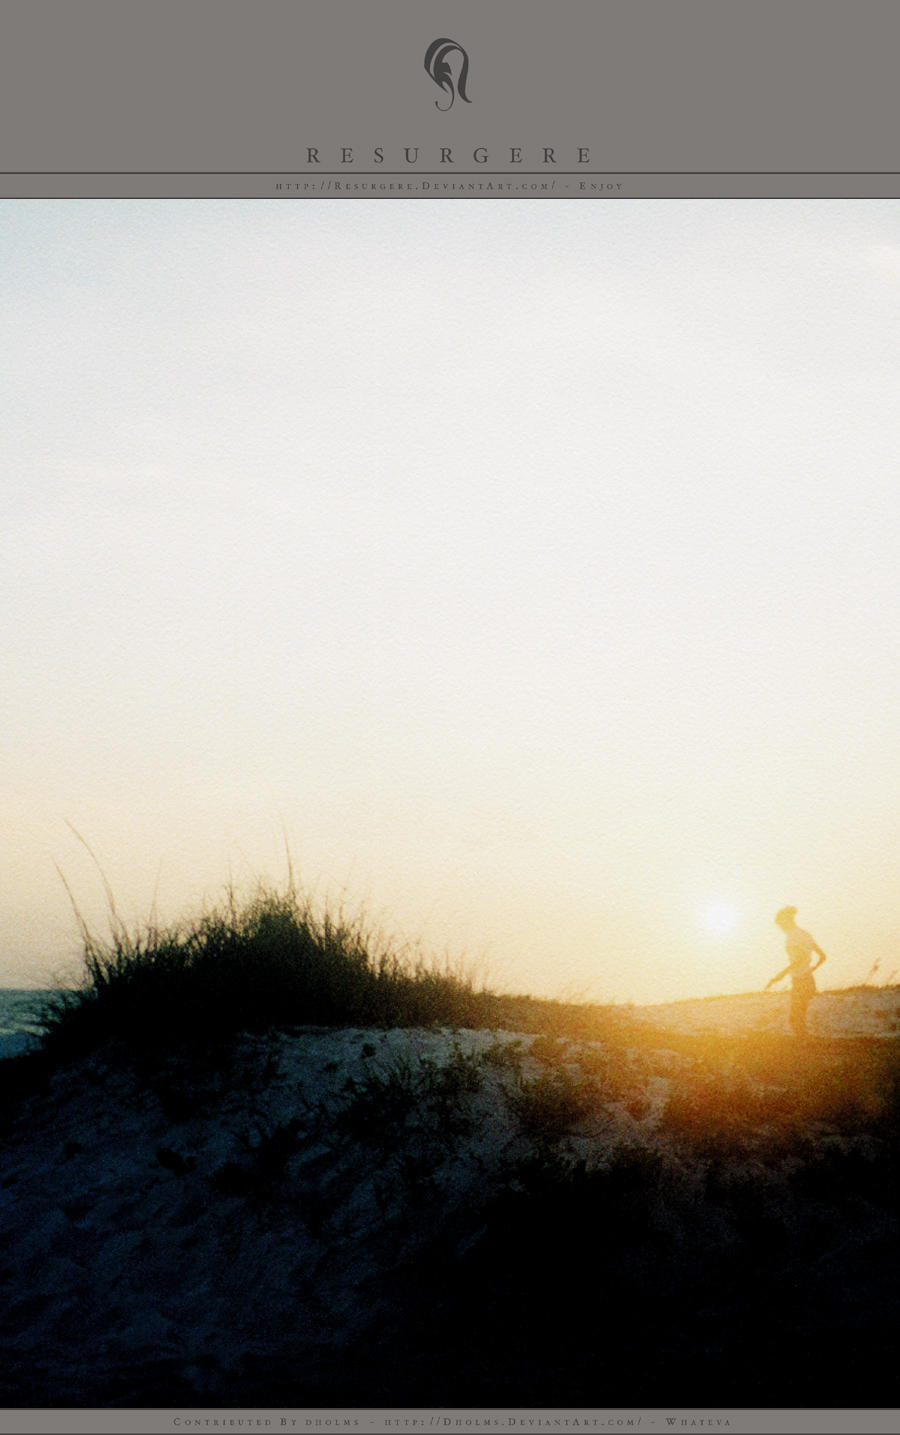 dani's beach - photo by resurgere